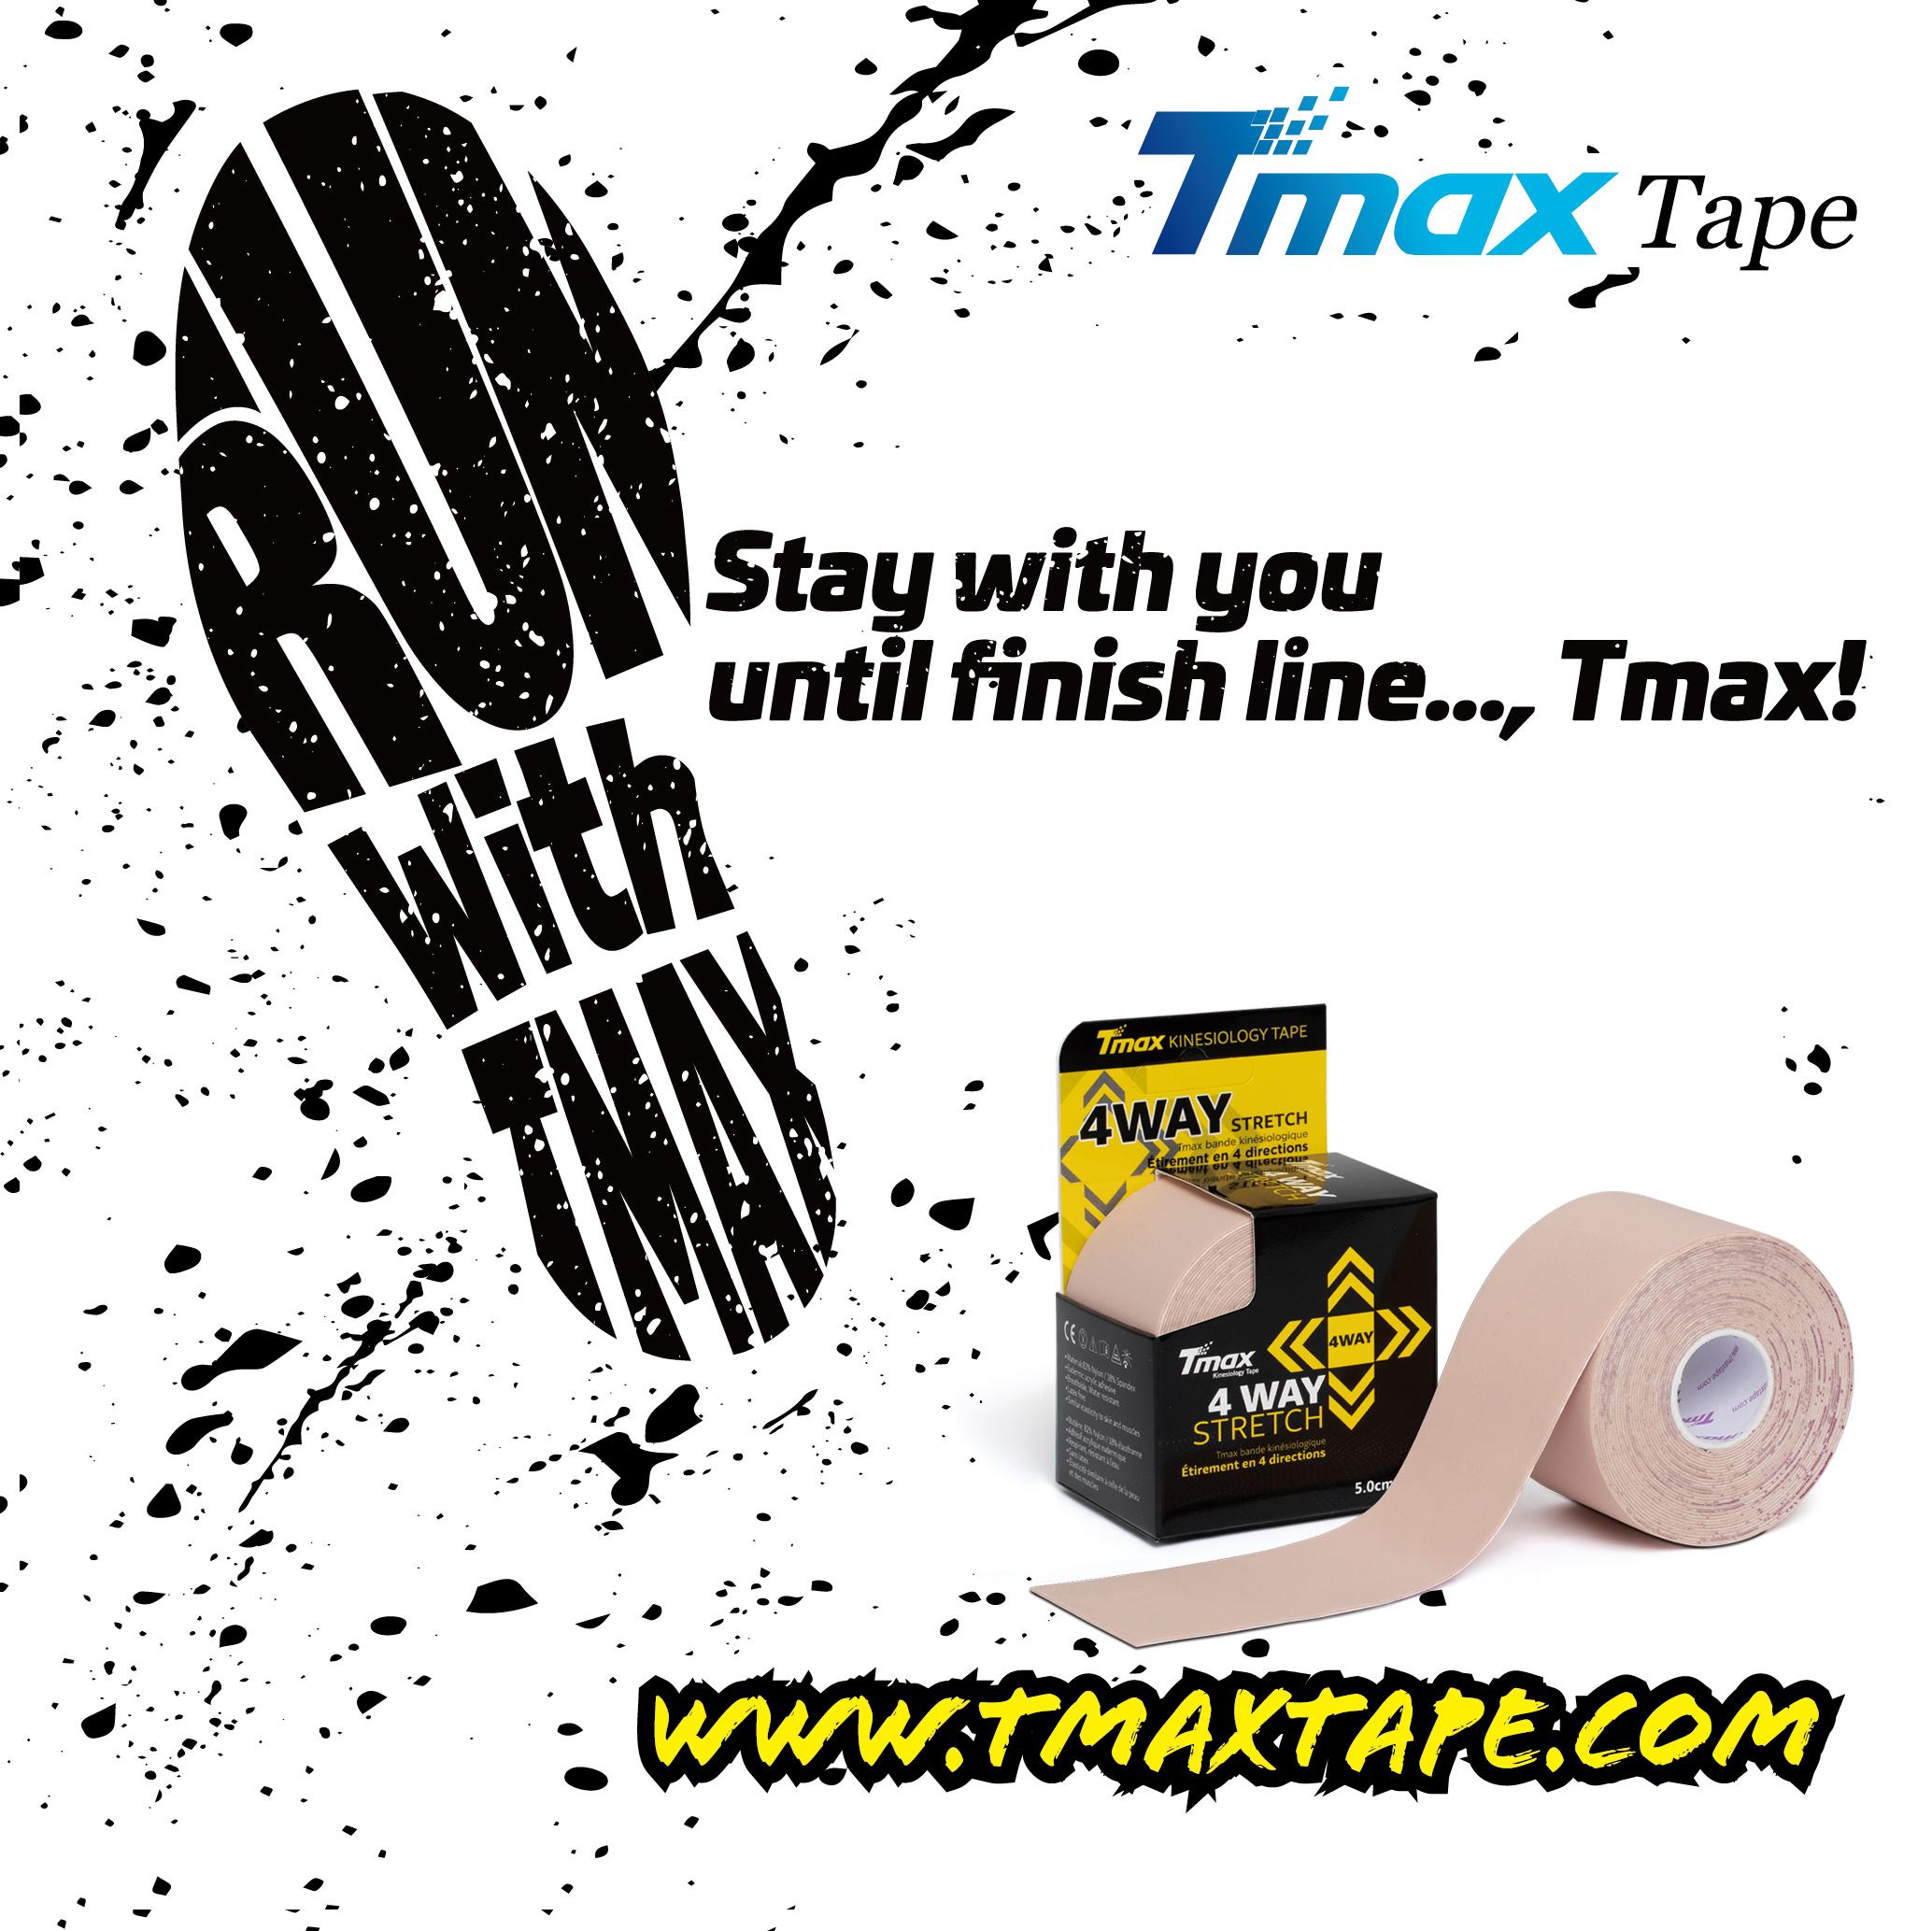 Tmax 4 Way Stretch Tape, Färg: Beige, 5mx5cm